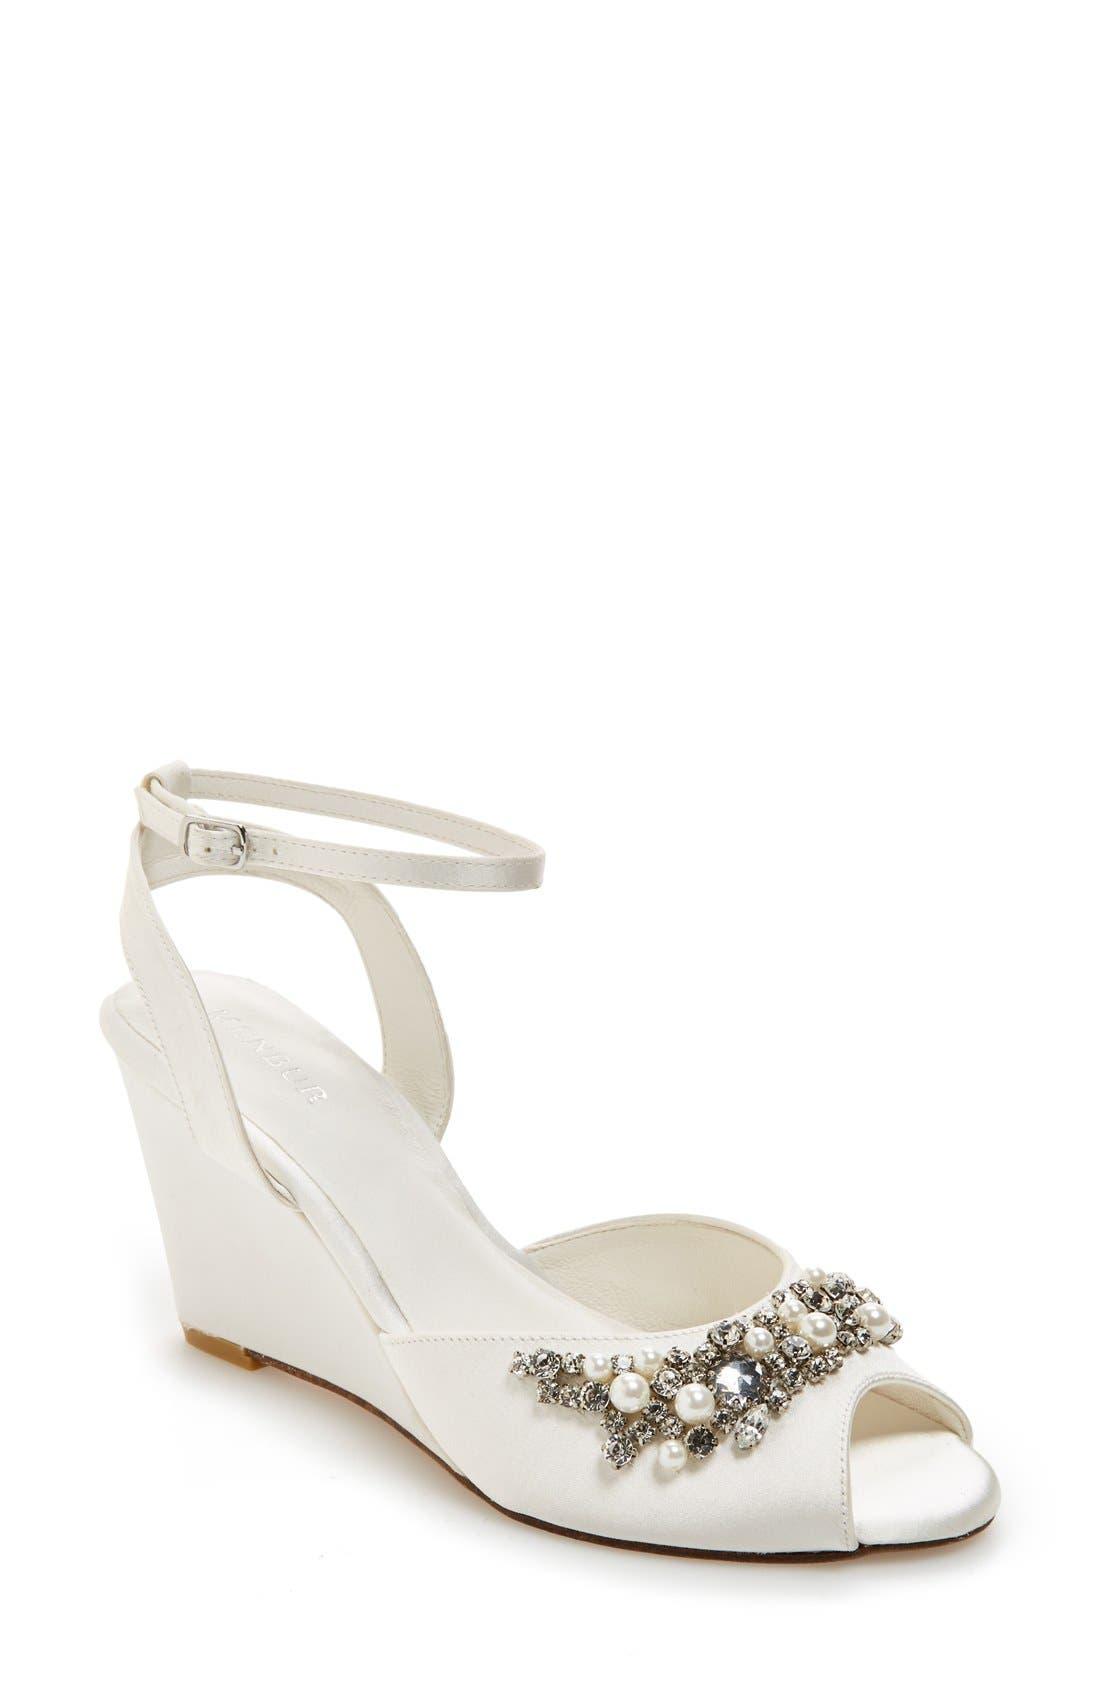 MENBUR 'Esther' Wedge Sandal